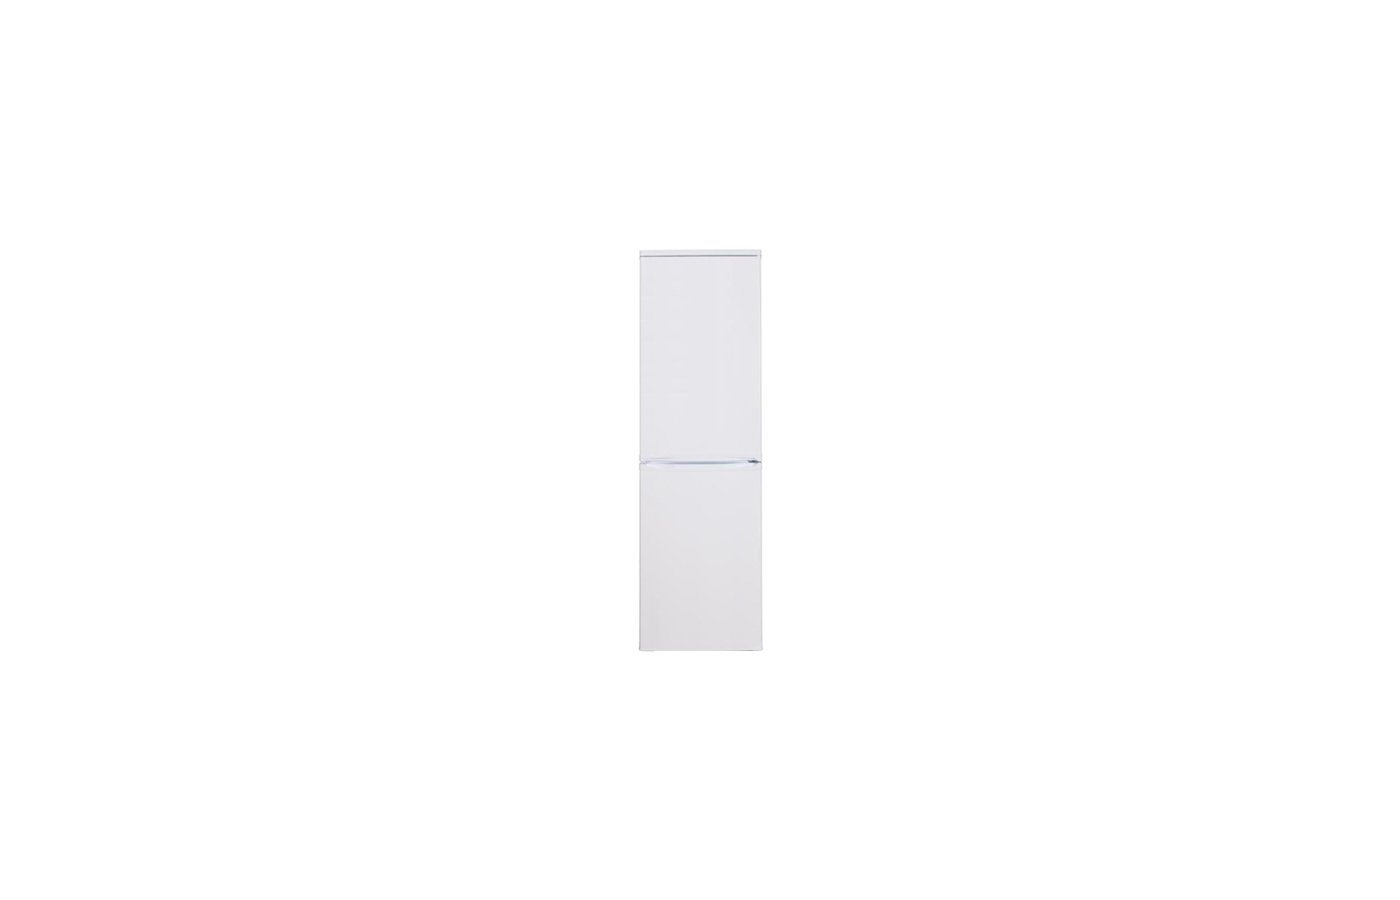 Холодильник DAEWOO RN-403